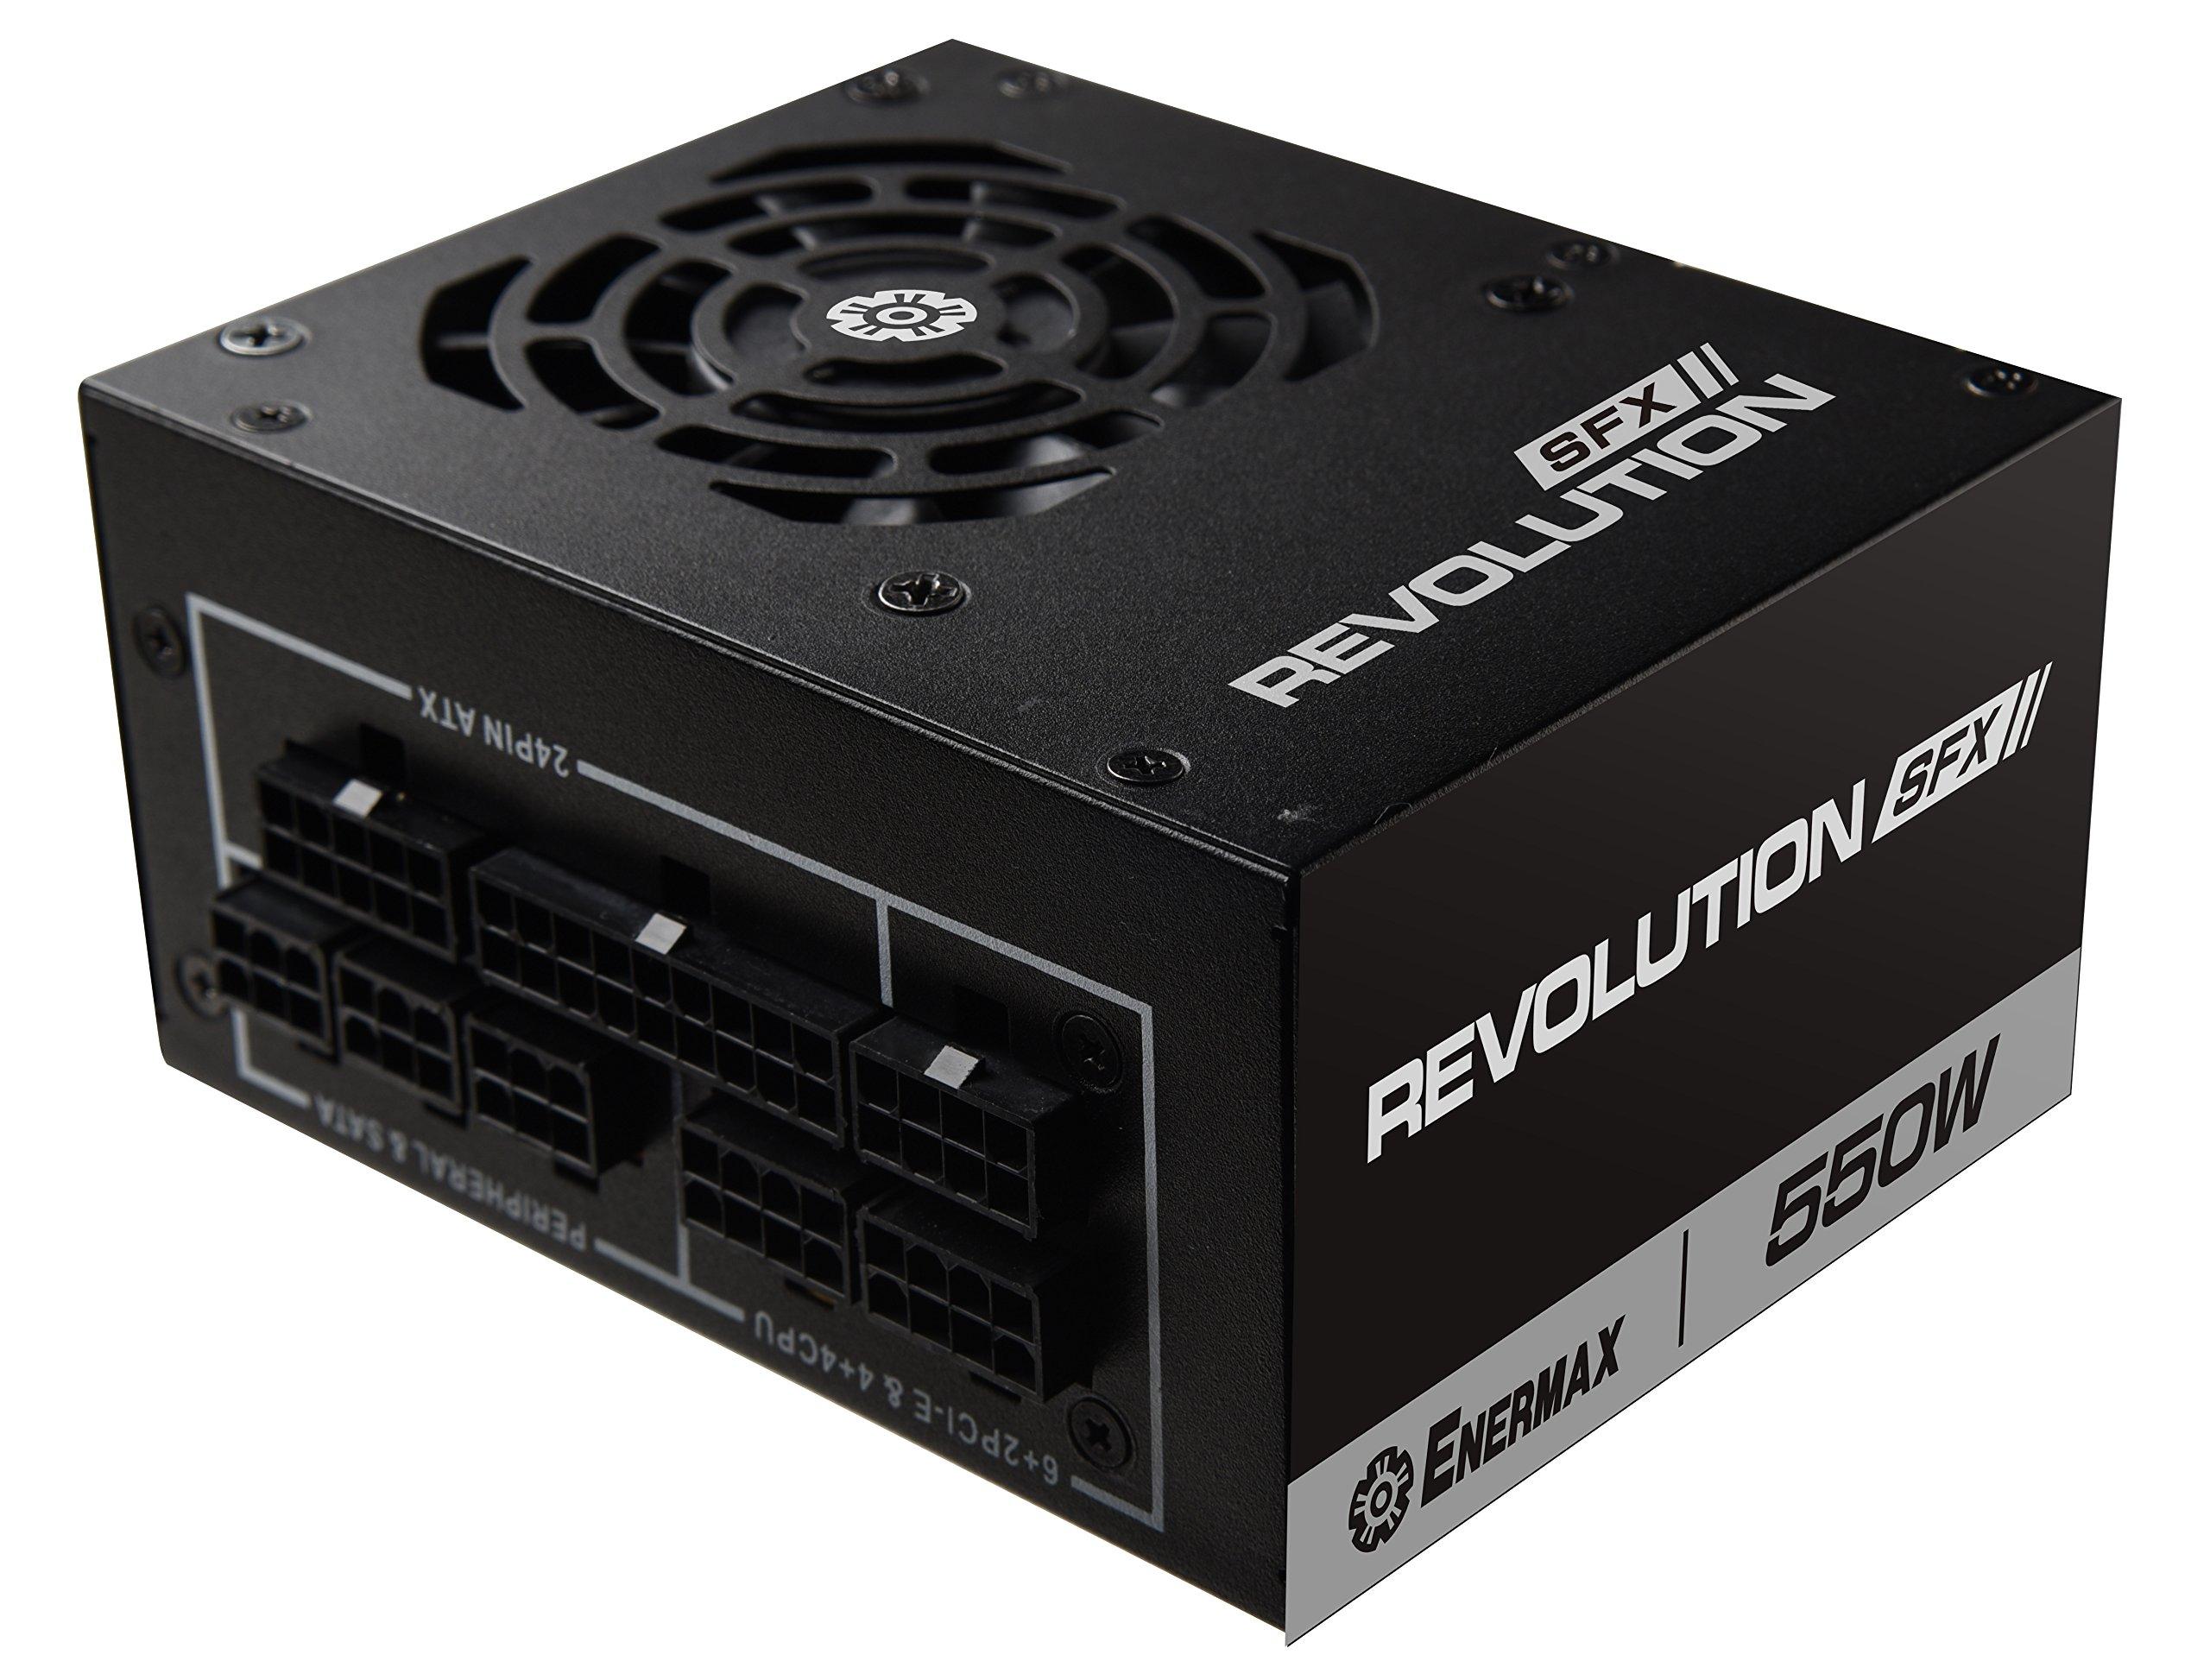 Enermax Revolution SFX 550W 80 Plus Gold Full Modular Semi-Fanless Power Supply with SFX-to-ATX PSU Adapter Bracket (ERV550SWT) |Free Q-Boom Bluetooth Speaker Inside|